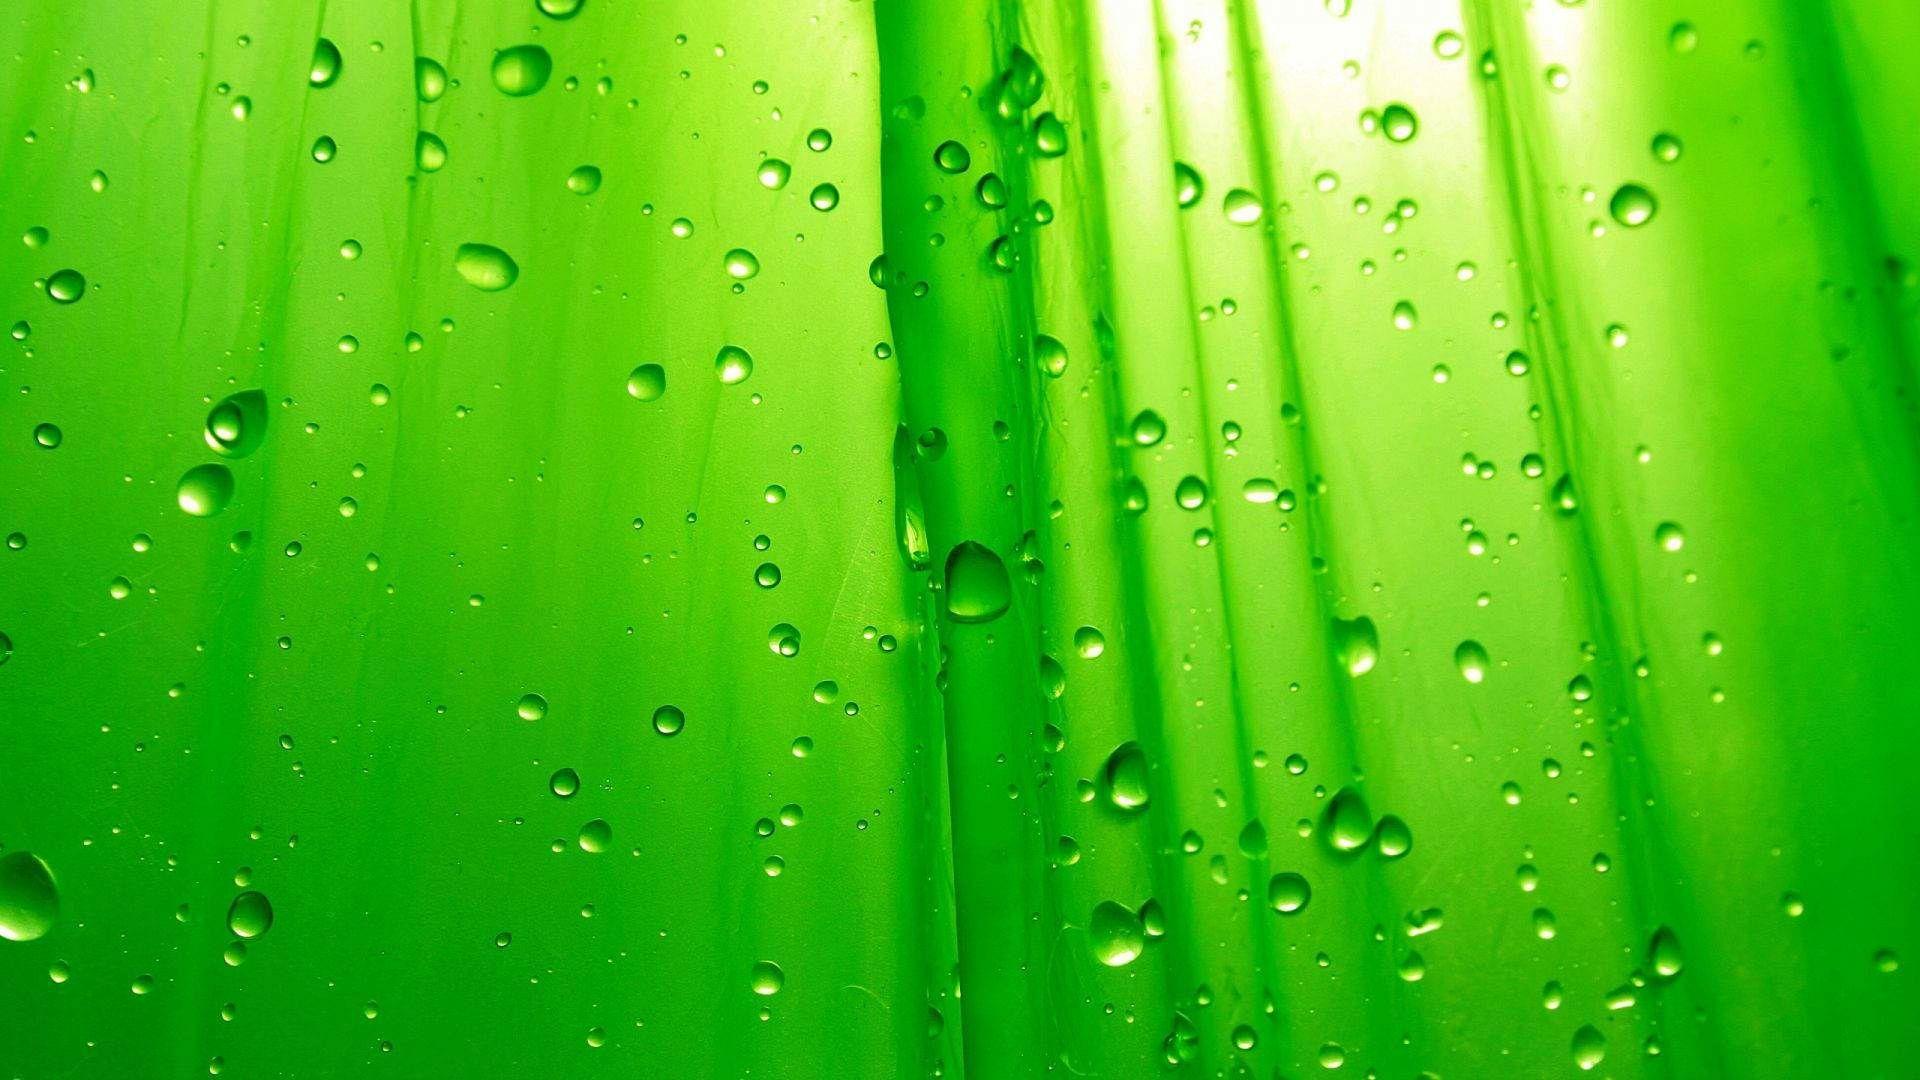 cool-green-backgrounds-wallpaper-1